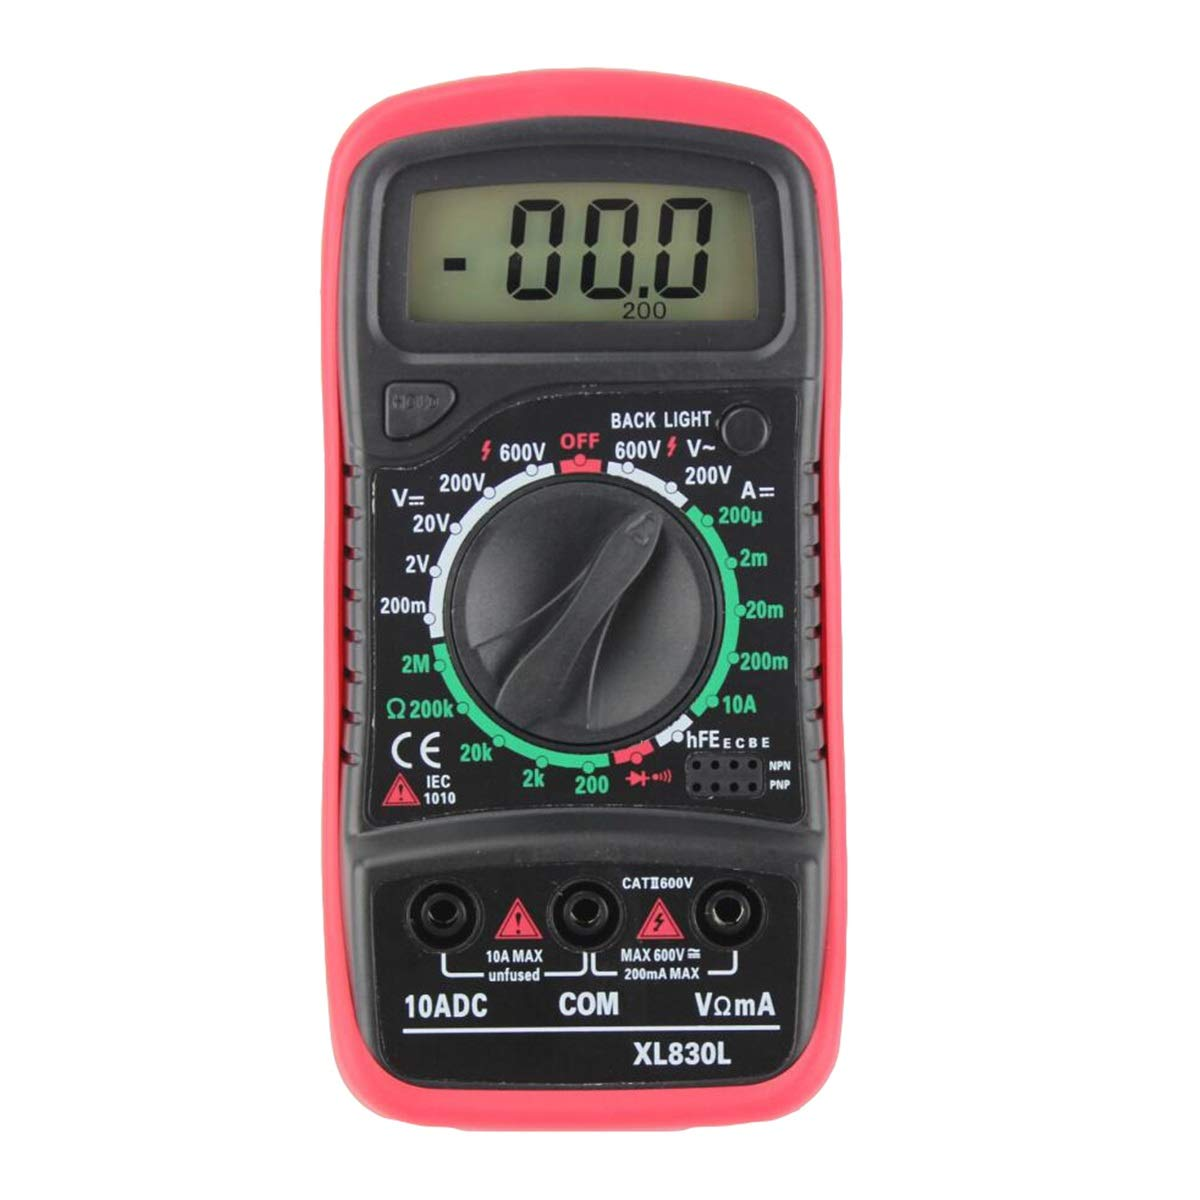 Hanpmy Multi Testers XL830L Digital LCD Multimeter Voltmeter Ammeter Color : Black No Cover